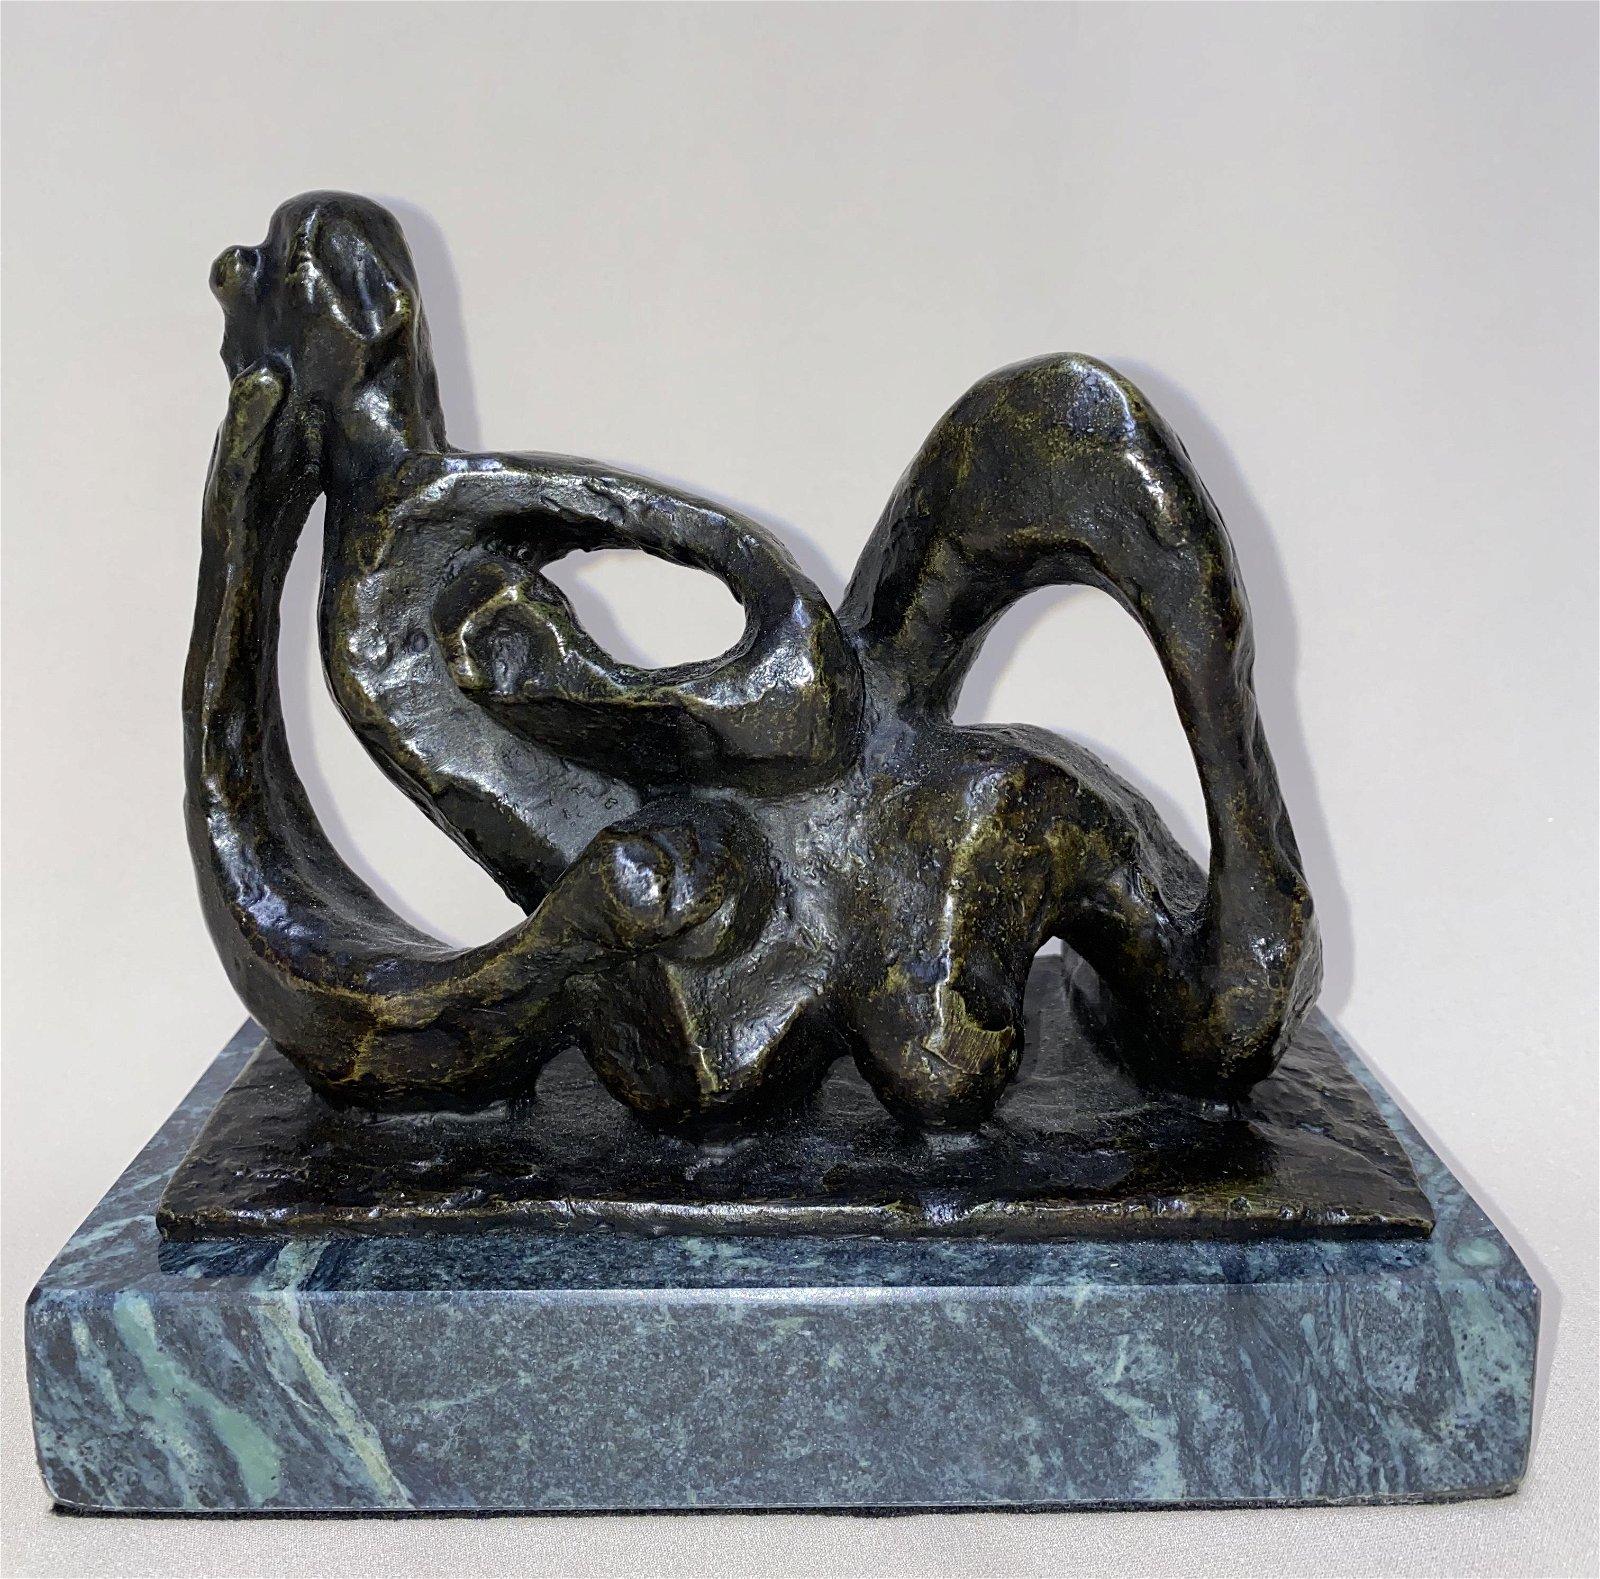 Lithuanian Bronze sculpture Jacoues Lipchitz